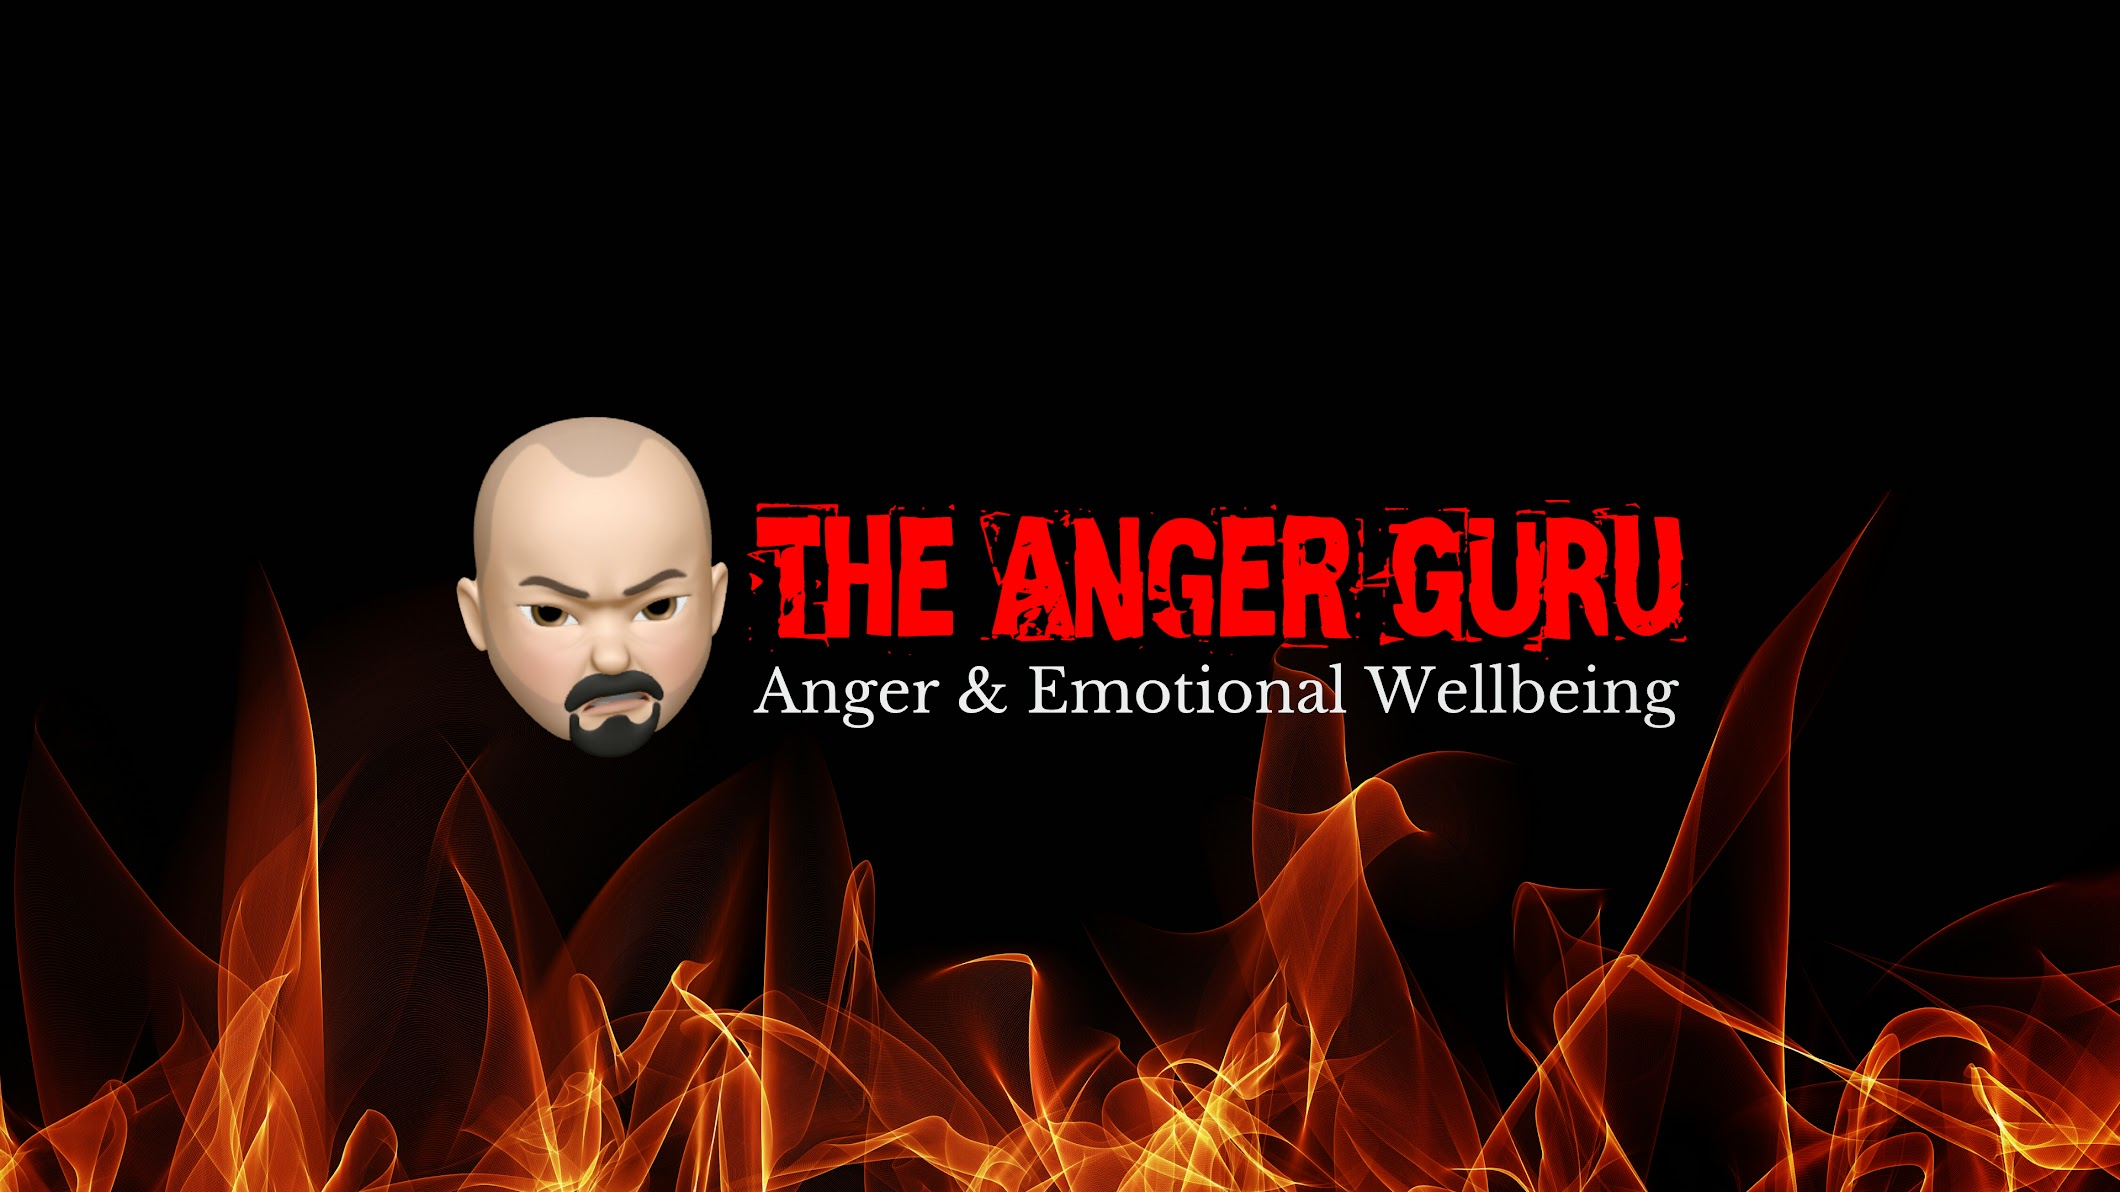 The Anger Guru